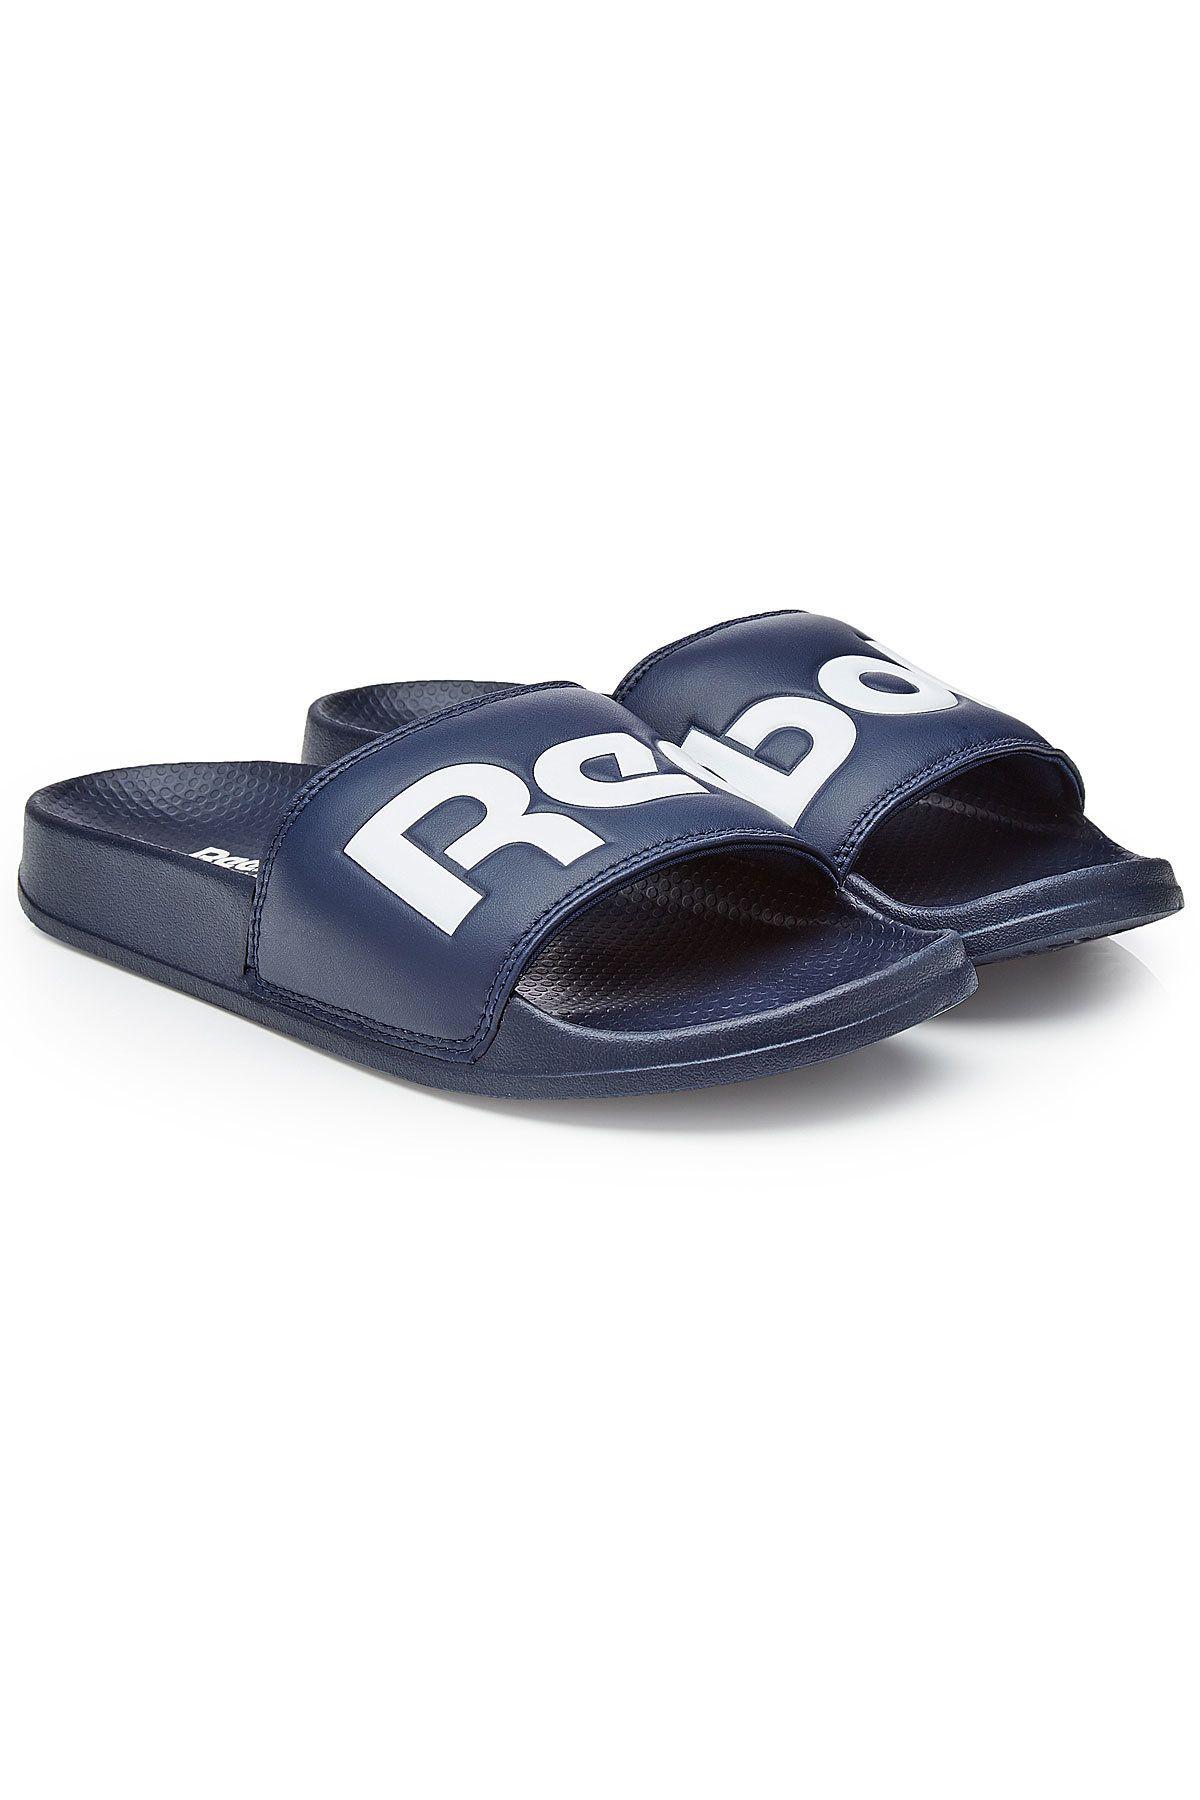 #reebok #shoes #